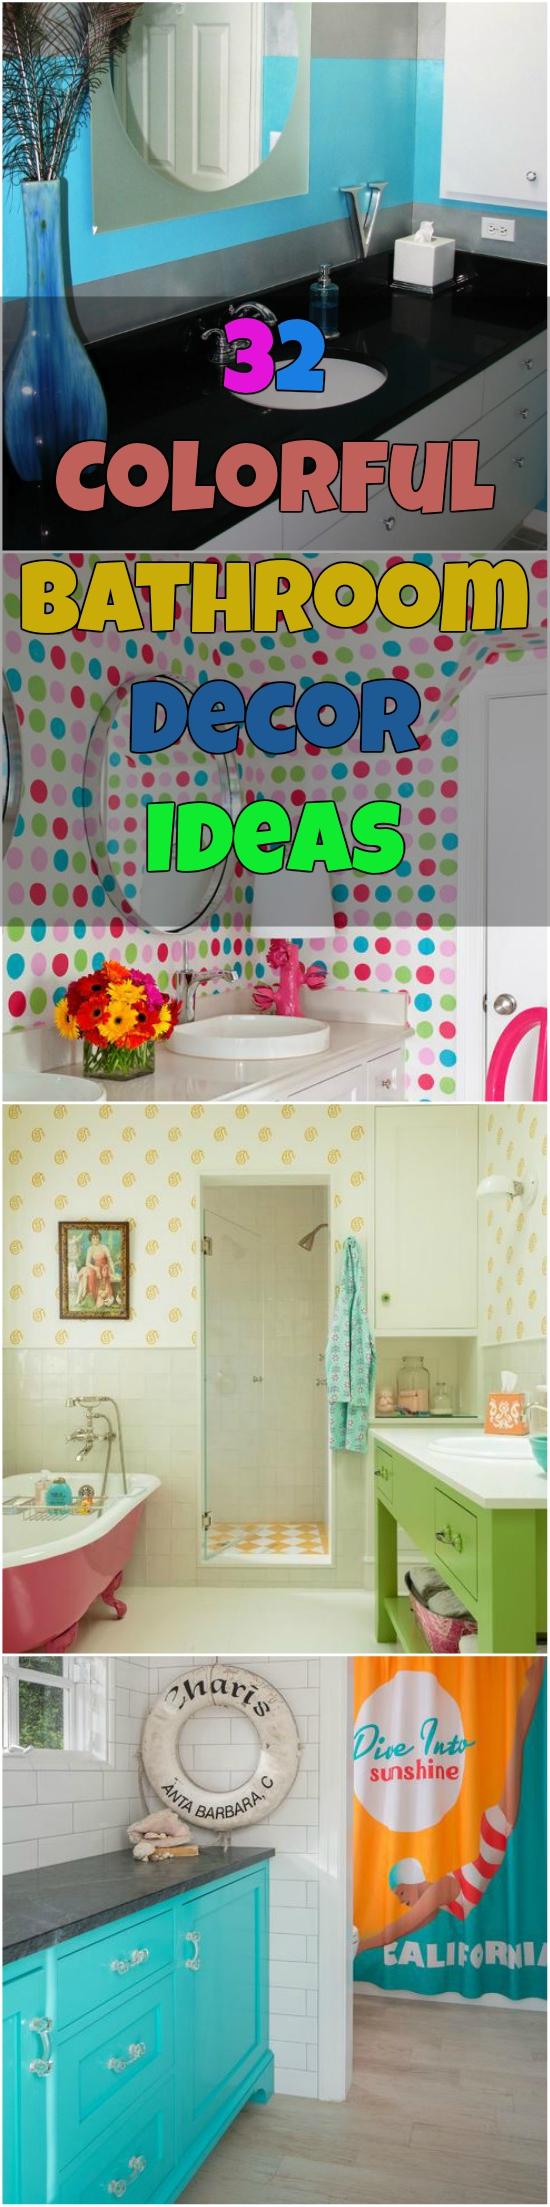 32 Colorful Bathroom Decor Ideas